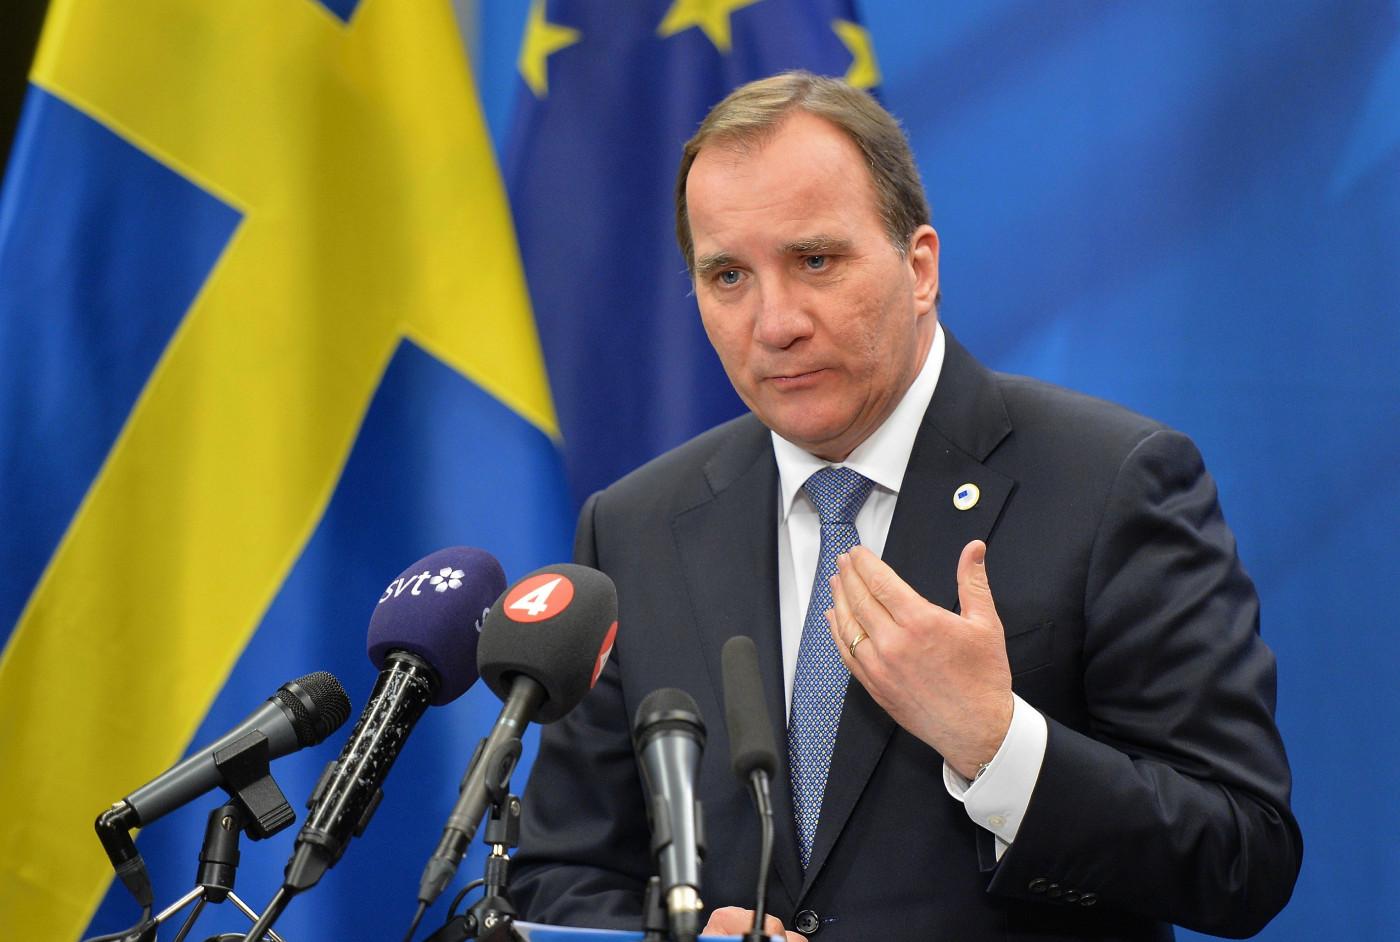 Sweden hosts North Korean foreign minister amid speculation